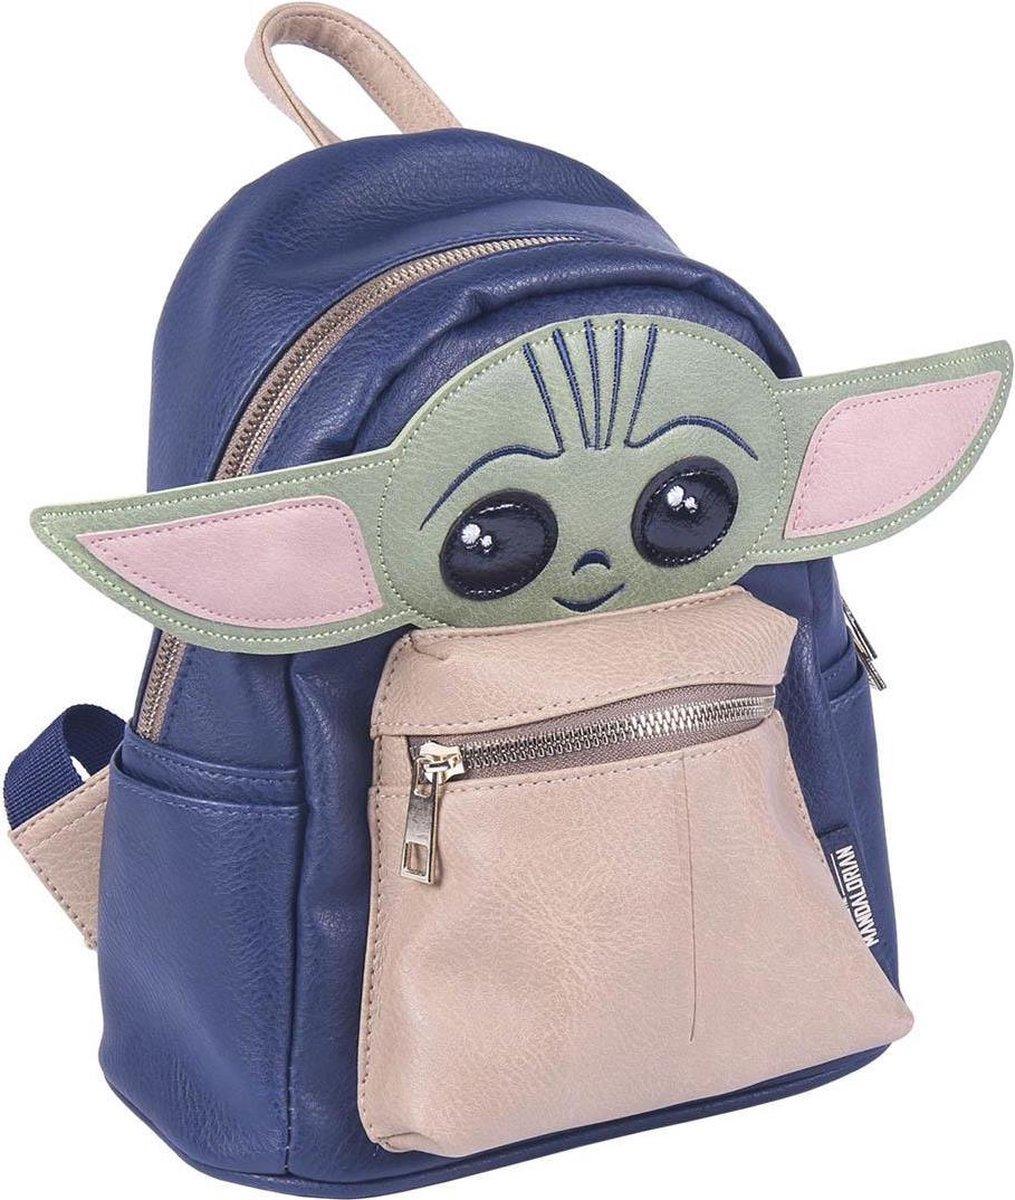 Disney Star Wars The Mandalorian - Rugzak - Baby Yoda - Hoogte 22cm